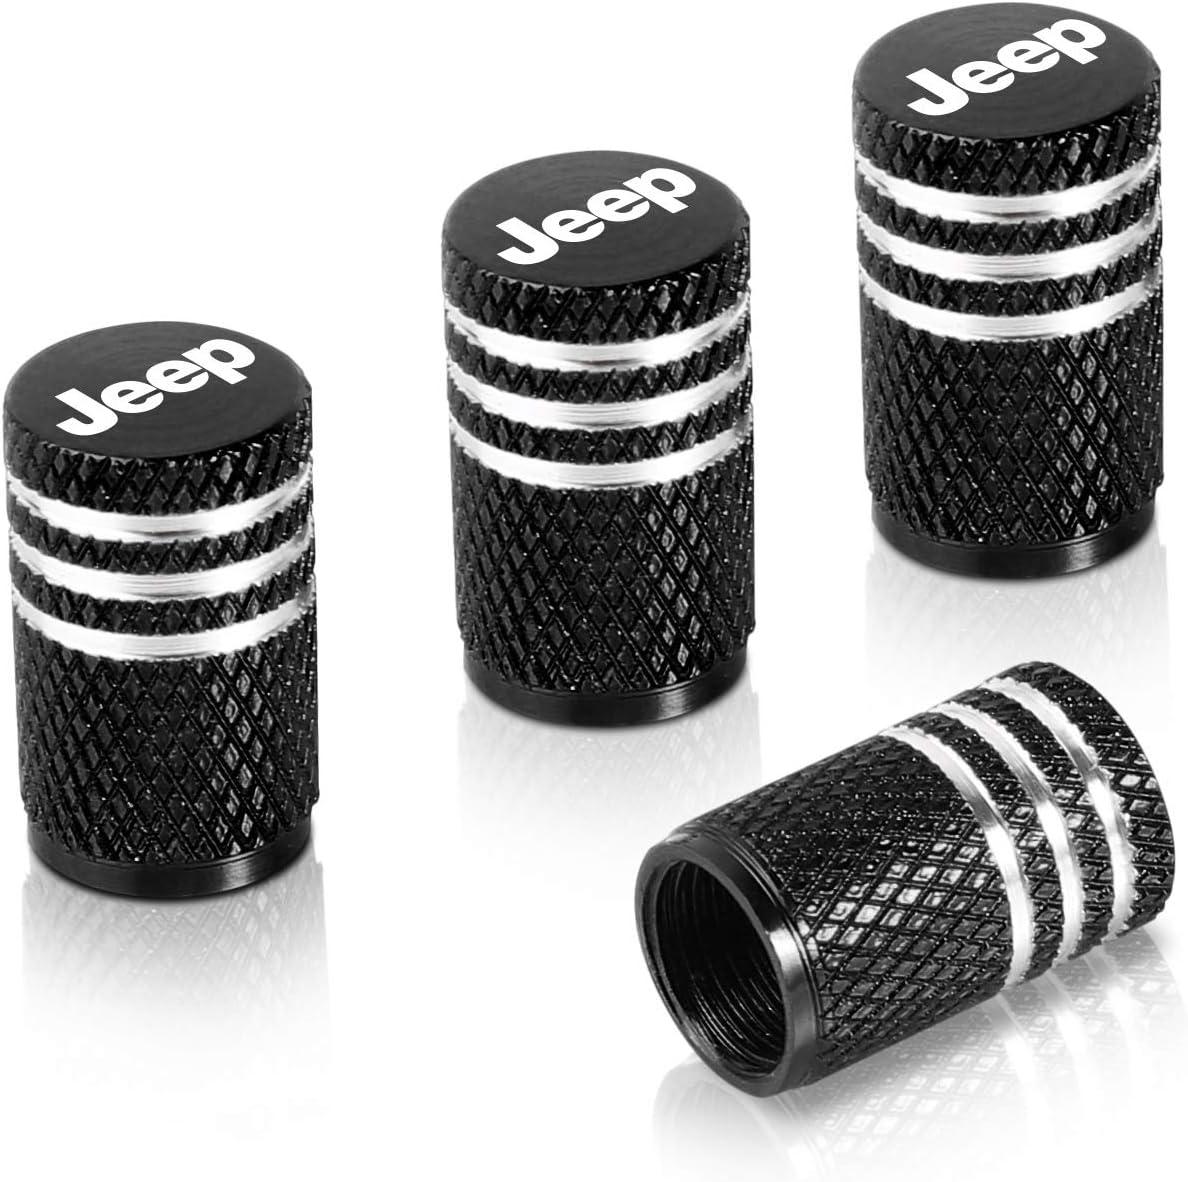 Qideloon Auto Tire Valve Caps,4pcs Aluminum Valve Stem Caps Universal fit for Car,Motorbike,Trucks,Bike and Bicycle red